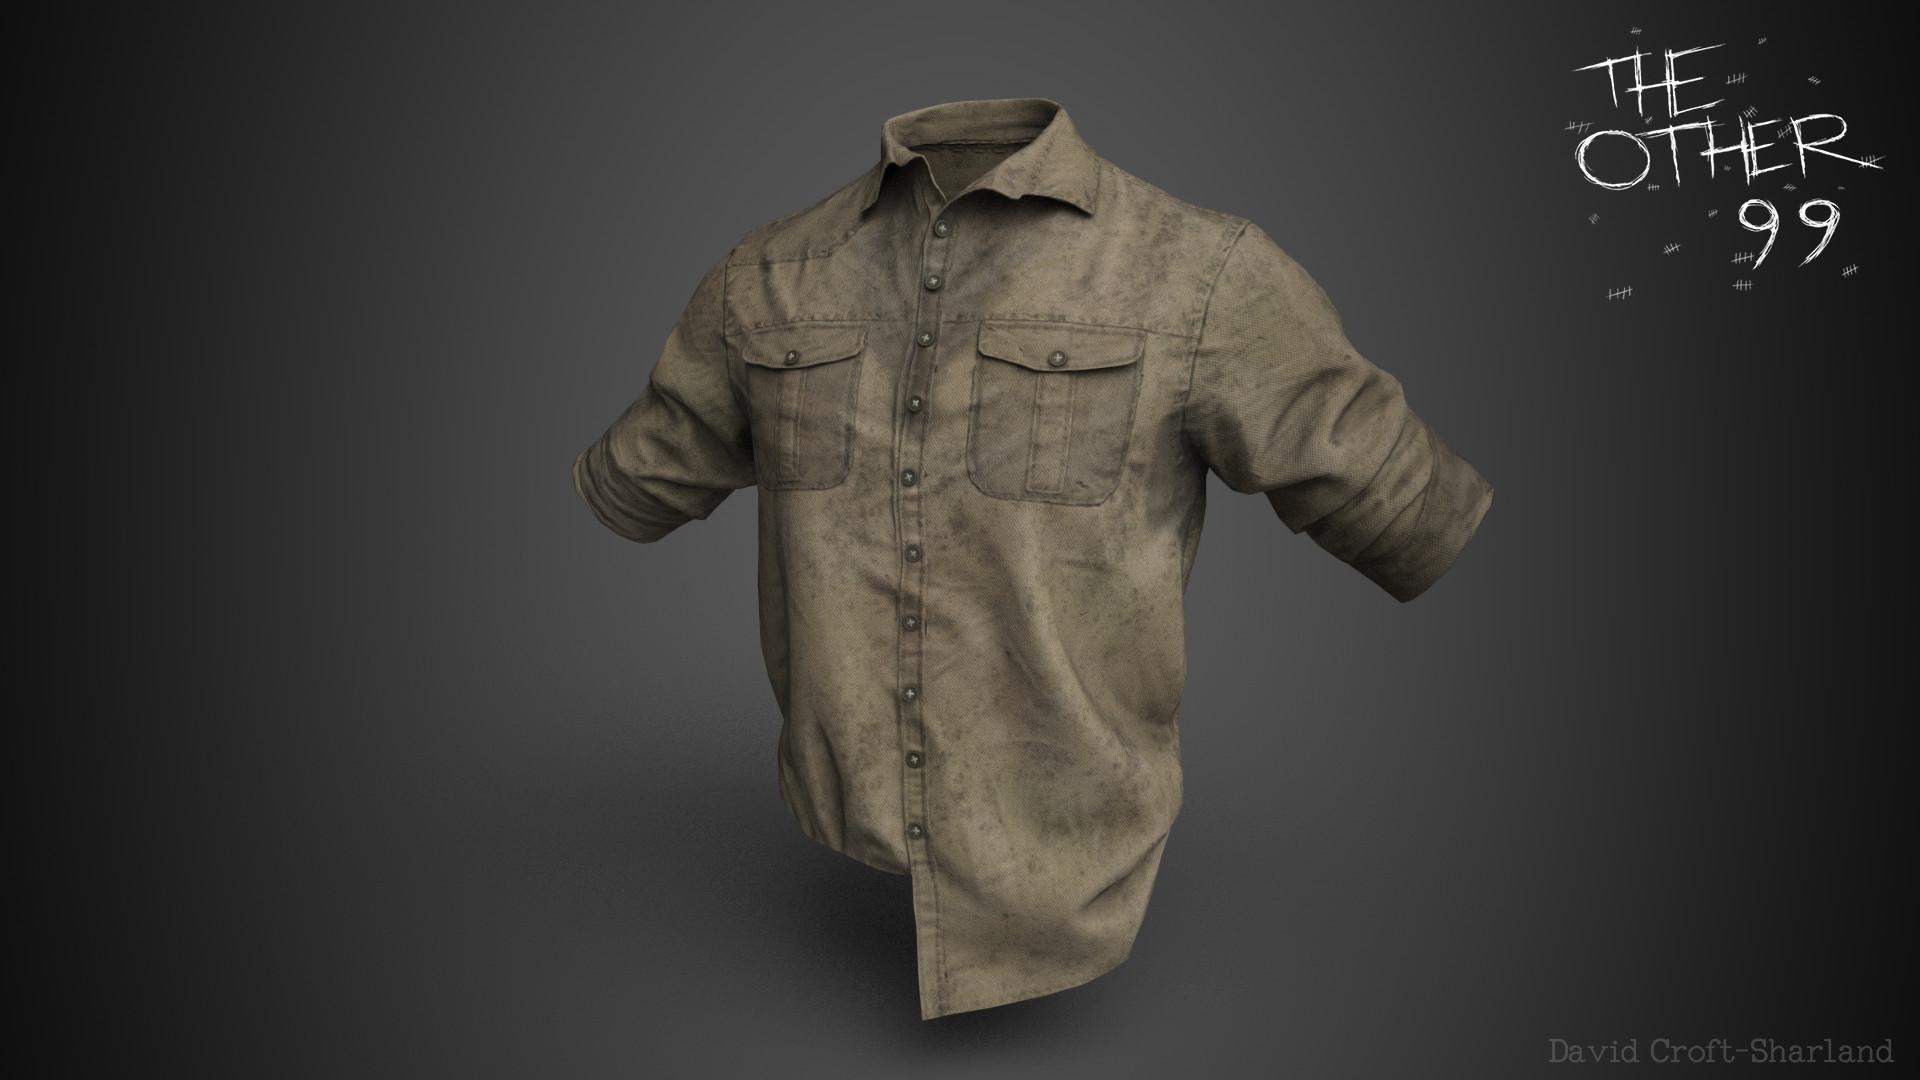 David croft sharland shirt